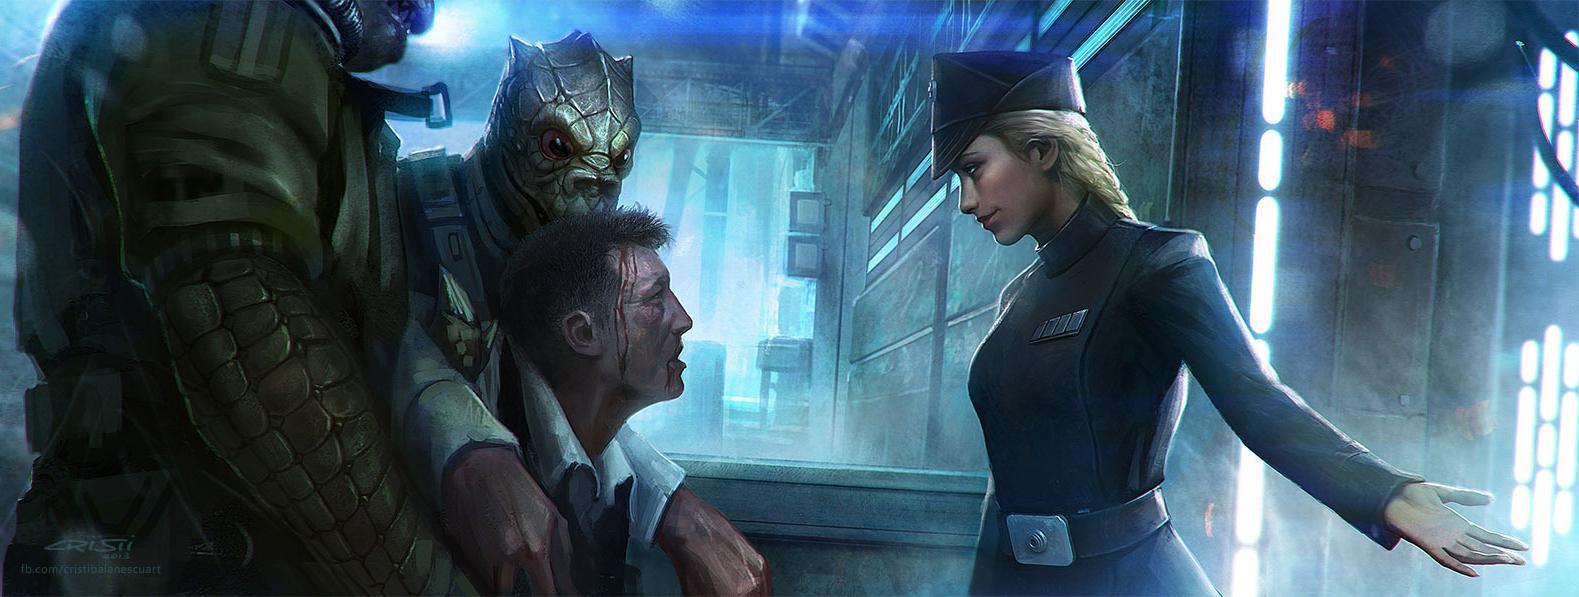 Unidentified female Imperial officer (mercenary backer)